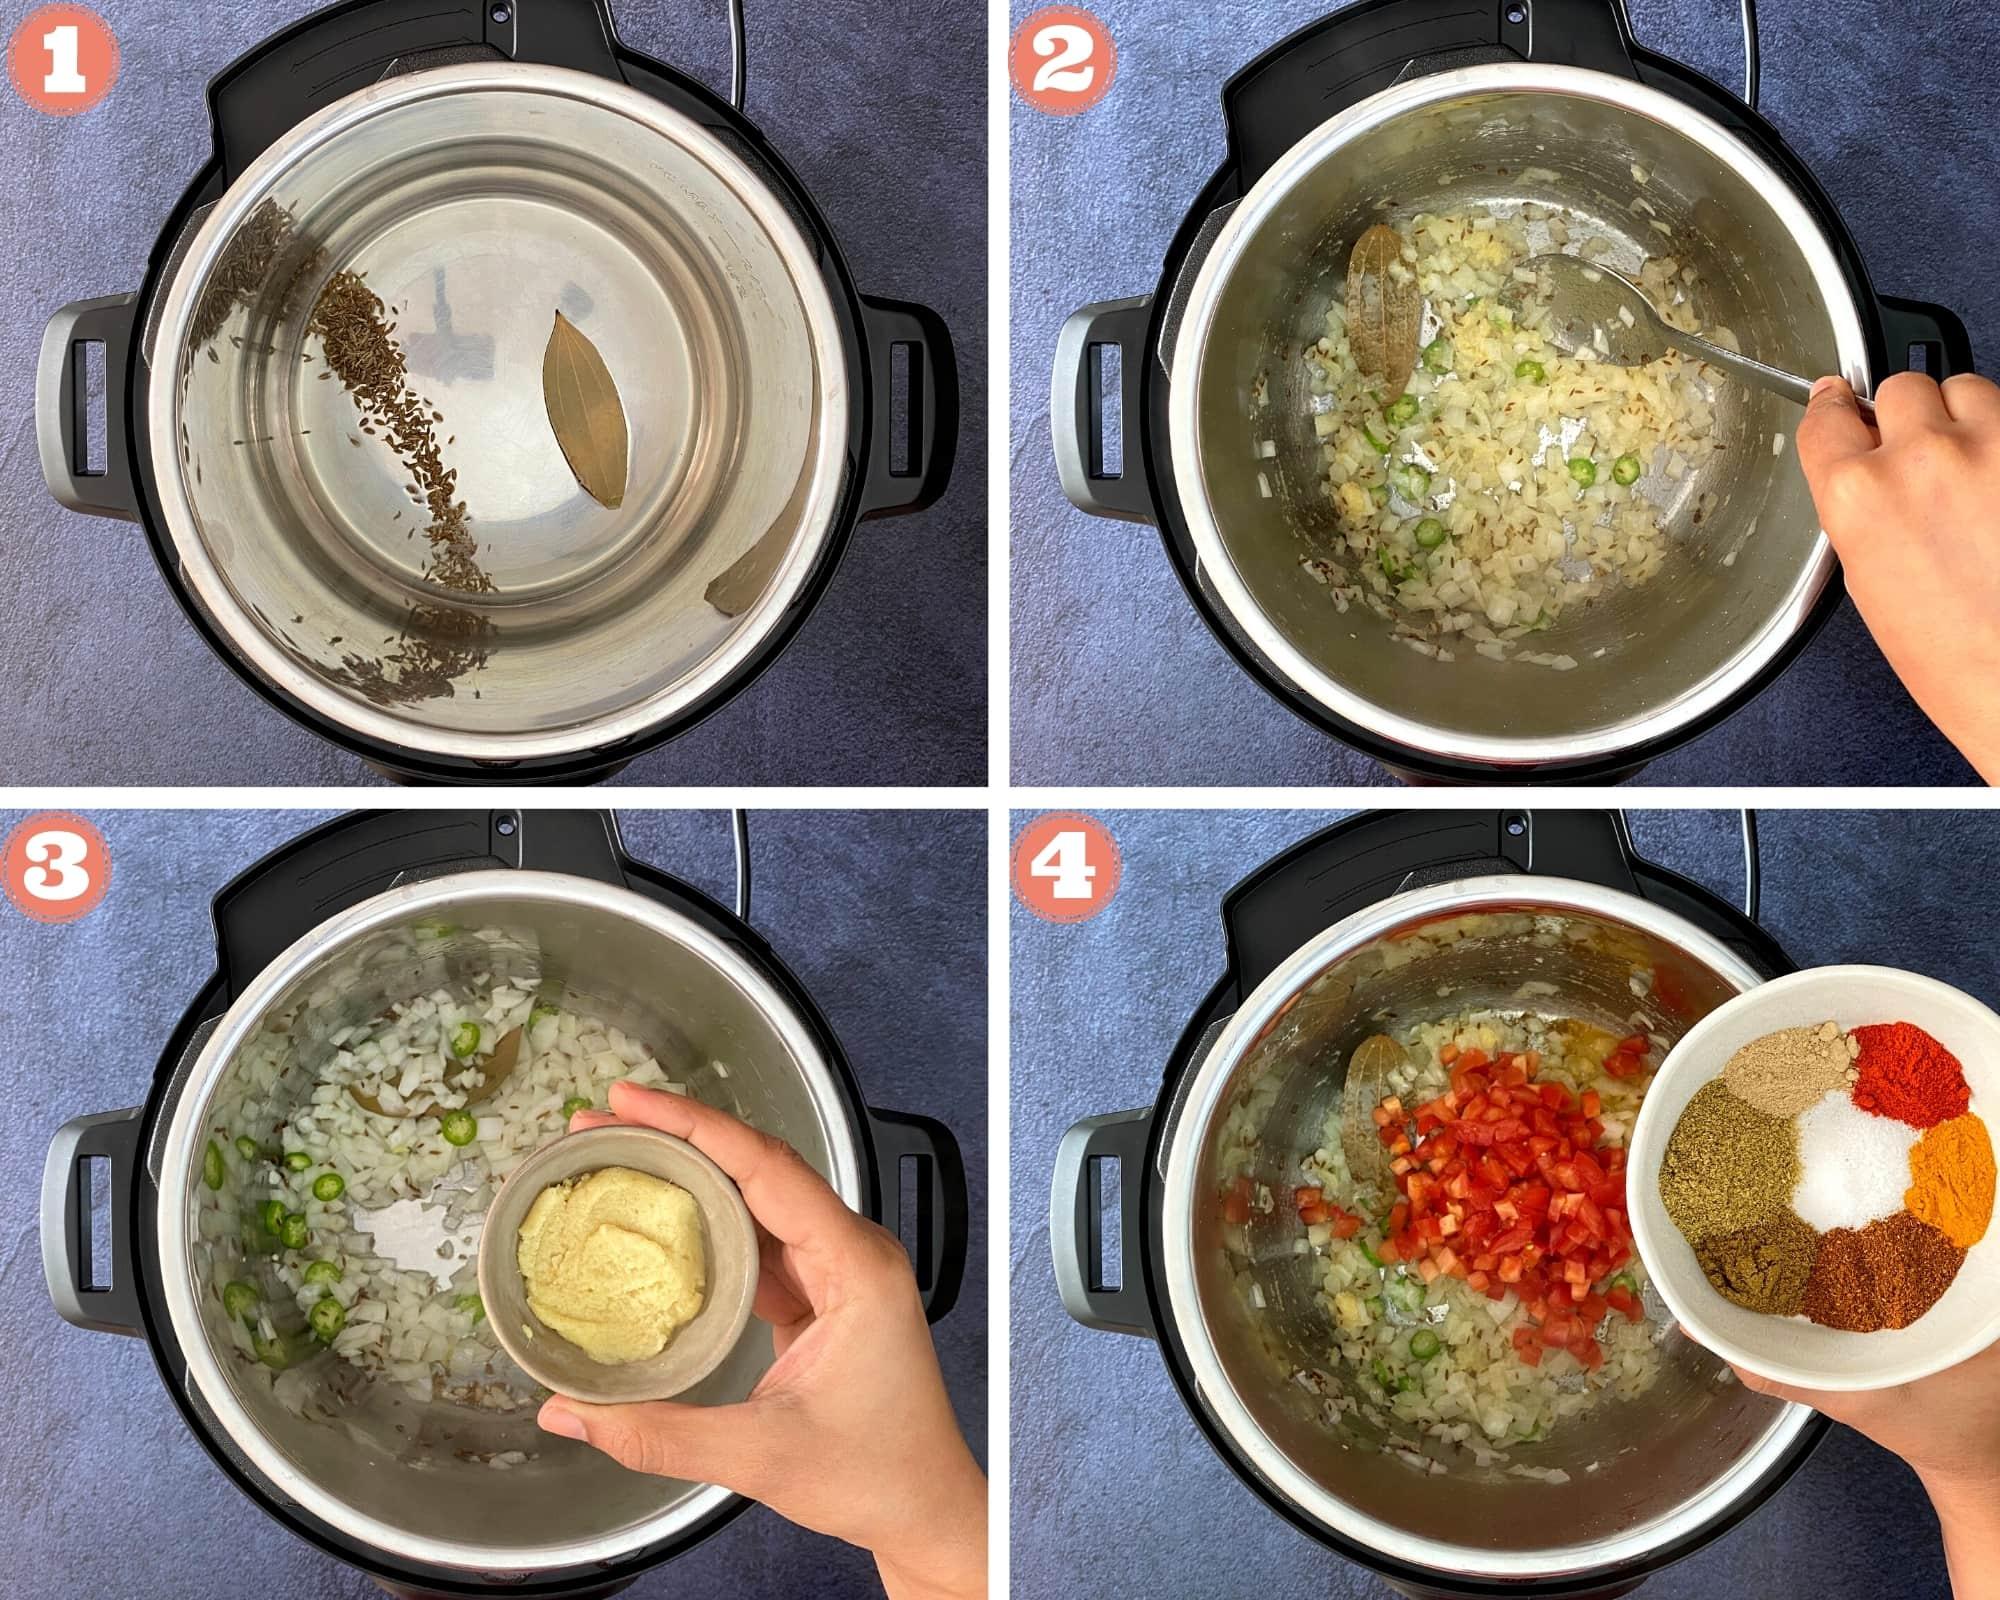 Steps 1 through 4 for Kala Chana Curry